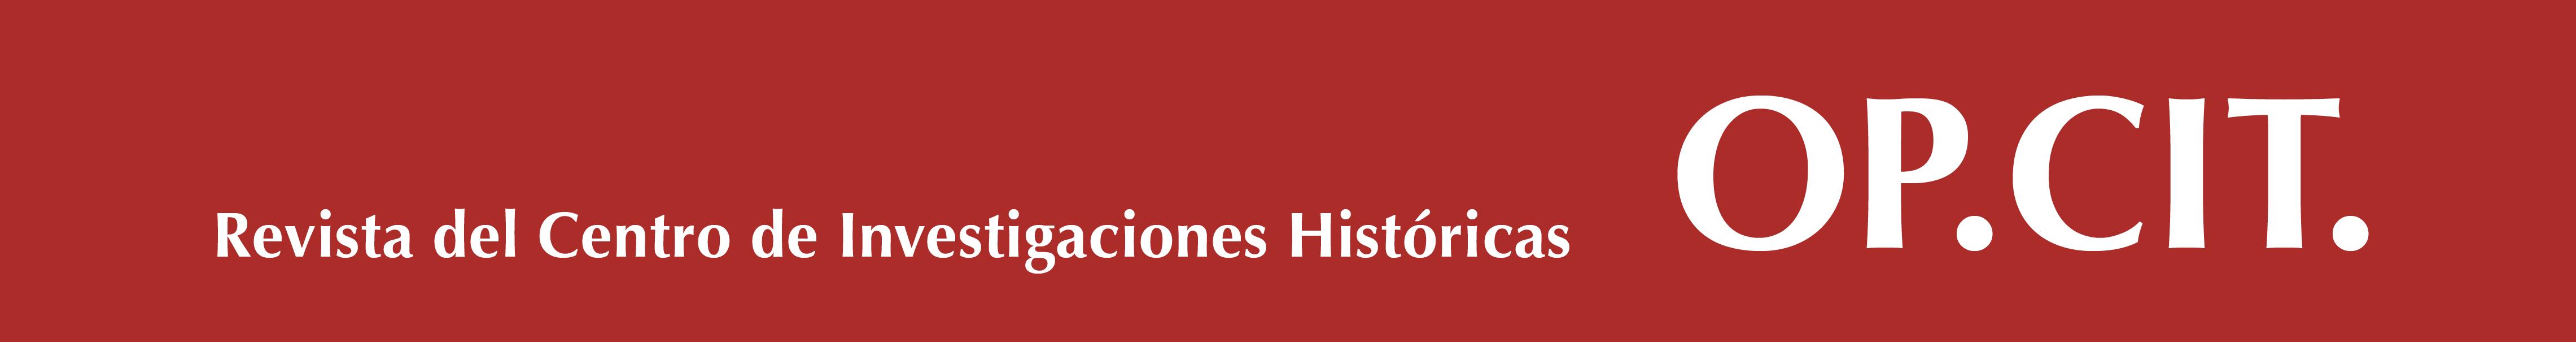 Op.Cit. Revista del Centro de Investigaciones Históricas